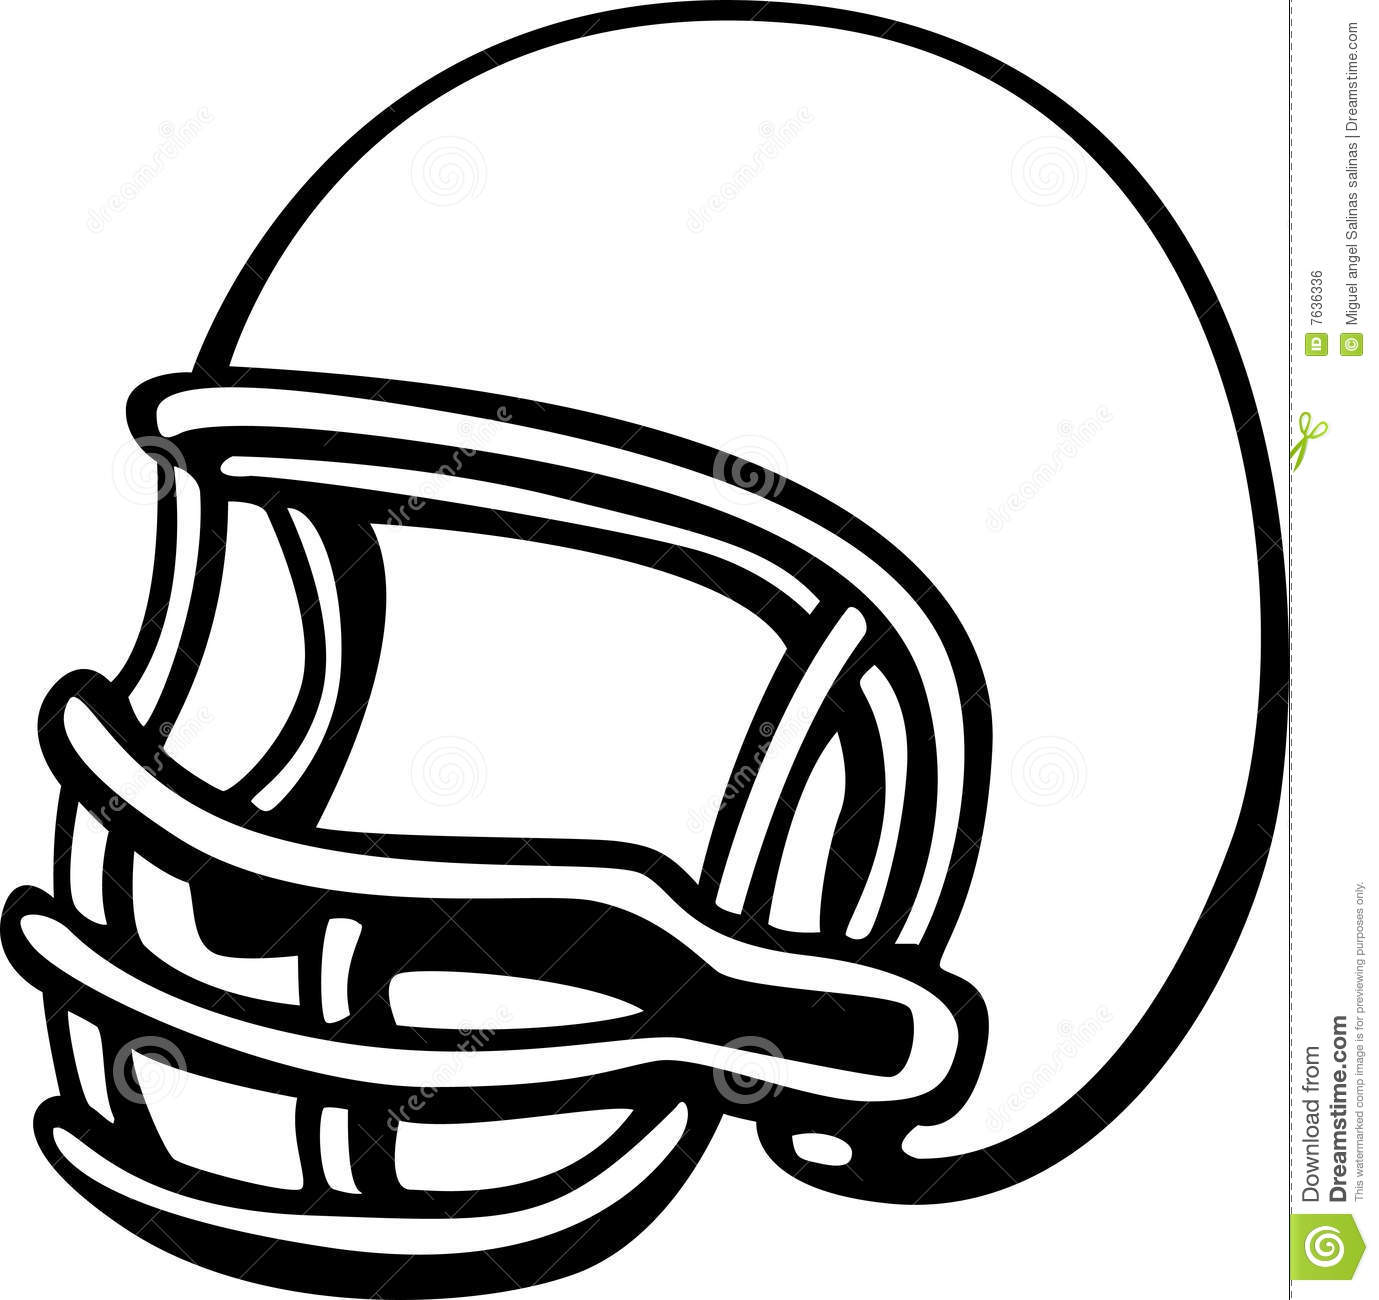 football helmet clip art front clipart panda free clipart images rh clipartpanda com football helmet clipart front football helmet clipart front view